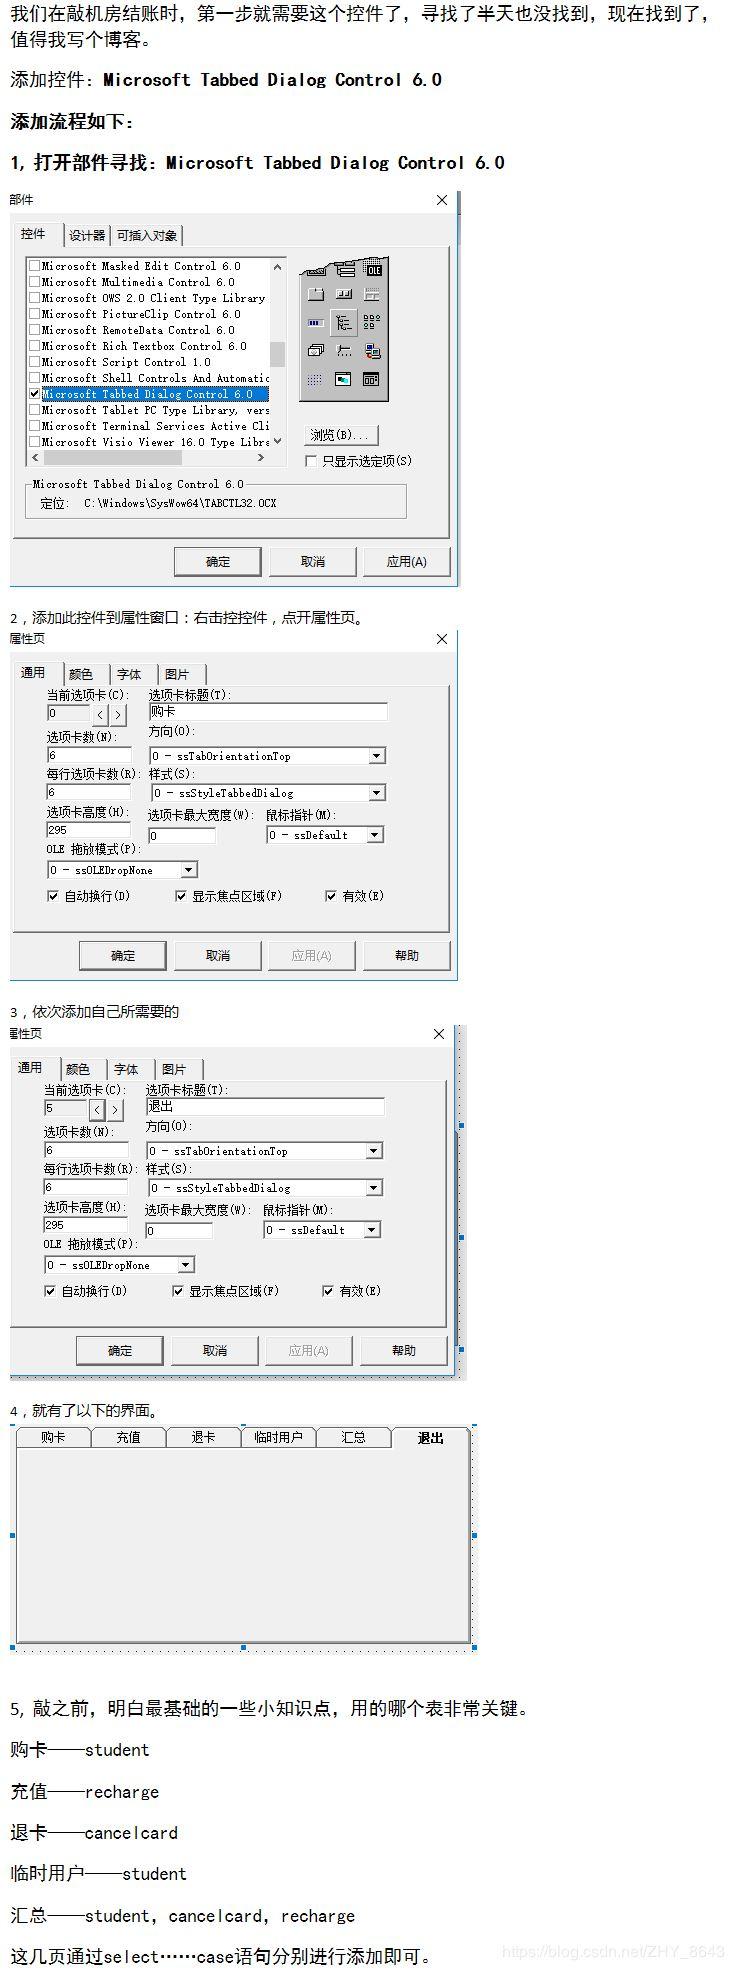 如何添加Microsoft Tabbed Dialog Control 6.0控件